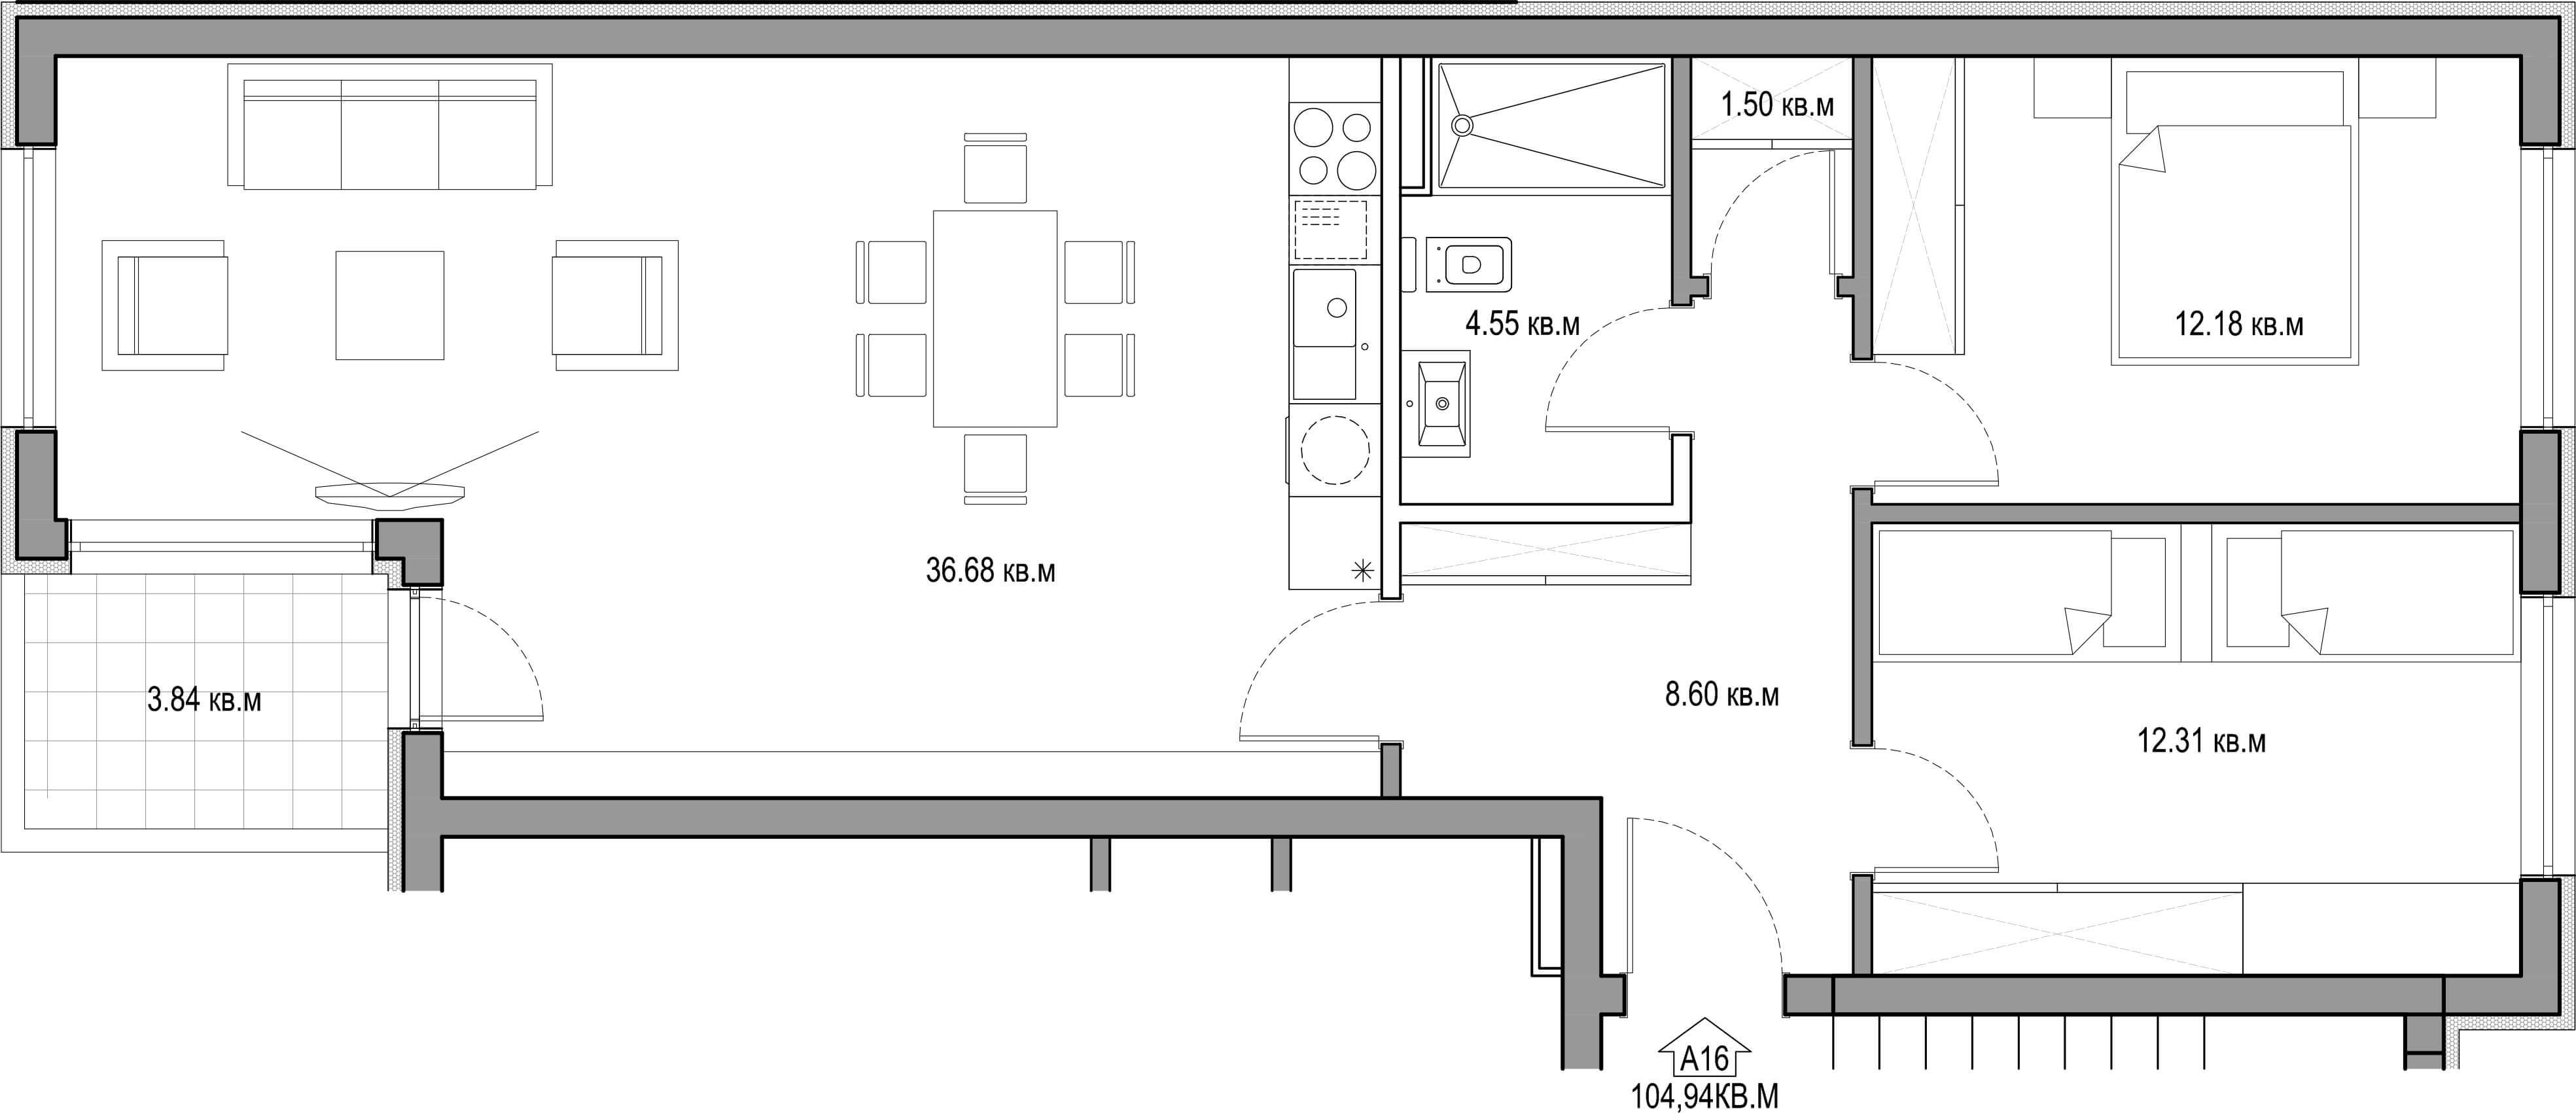 Vinitsa_Apartment_1_16